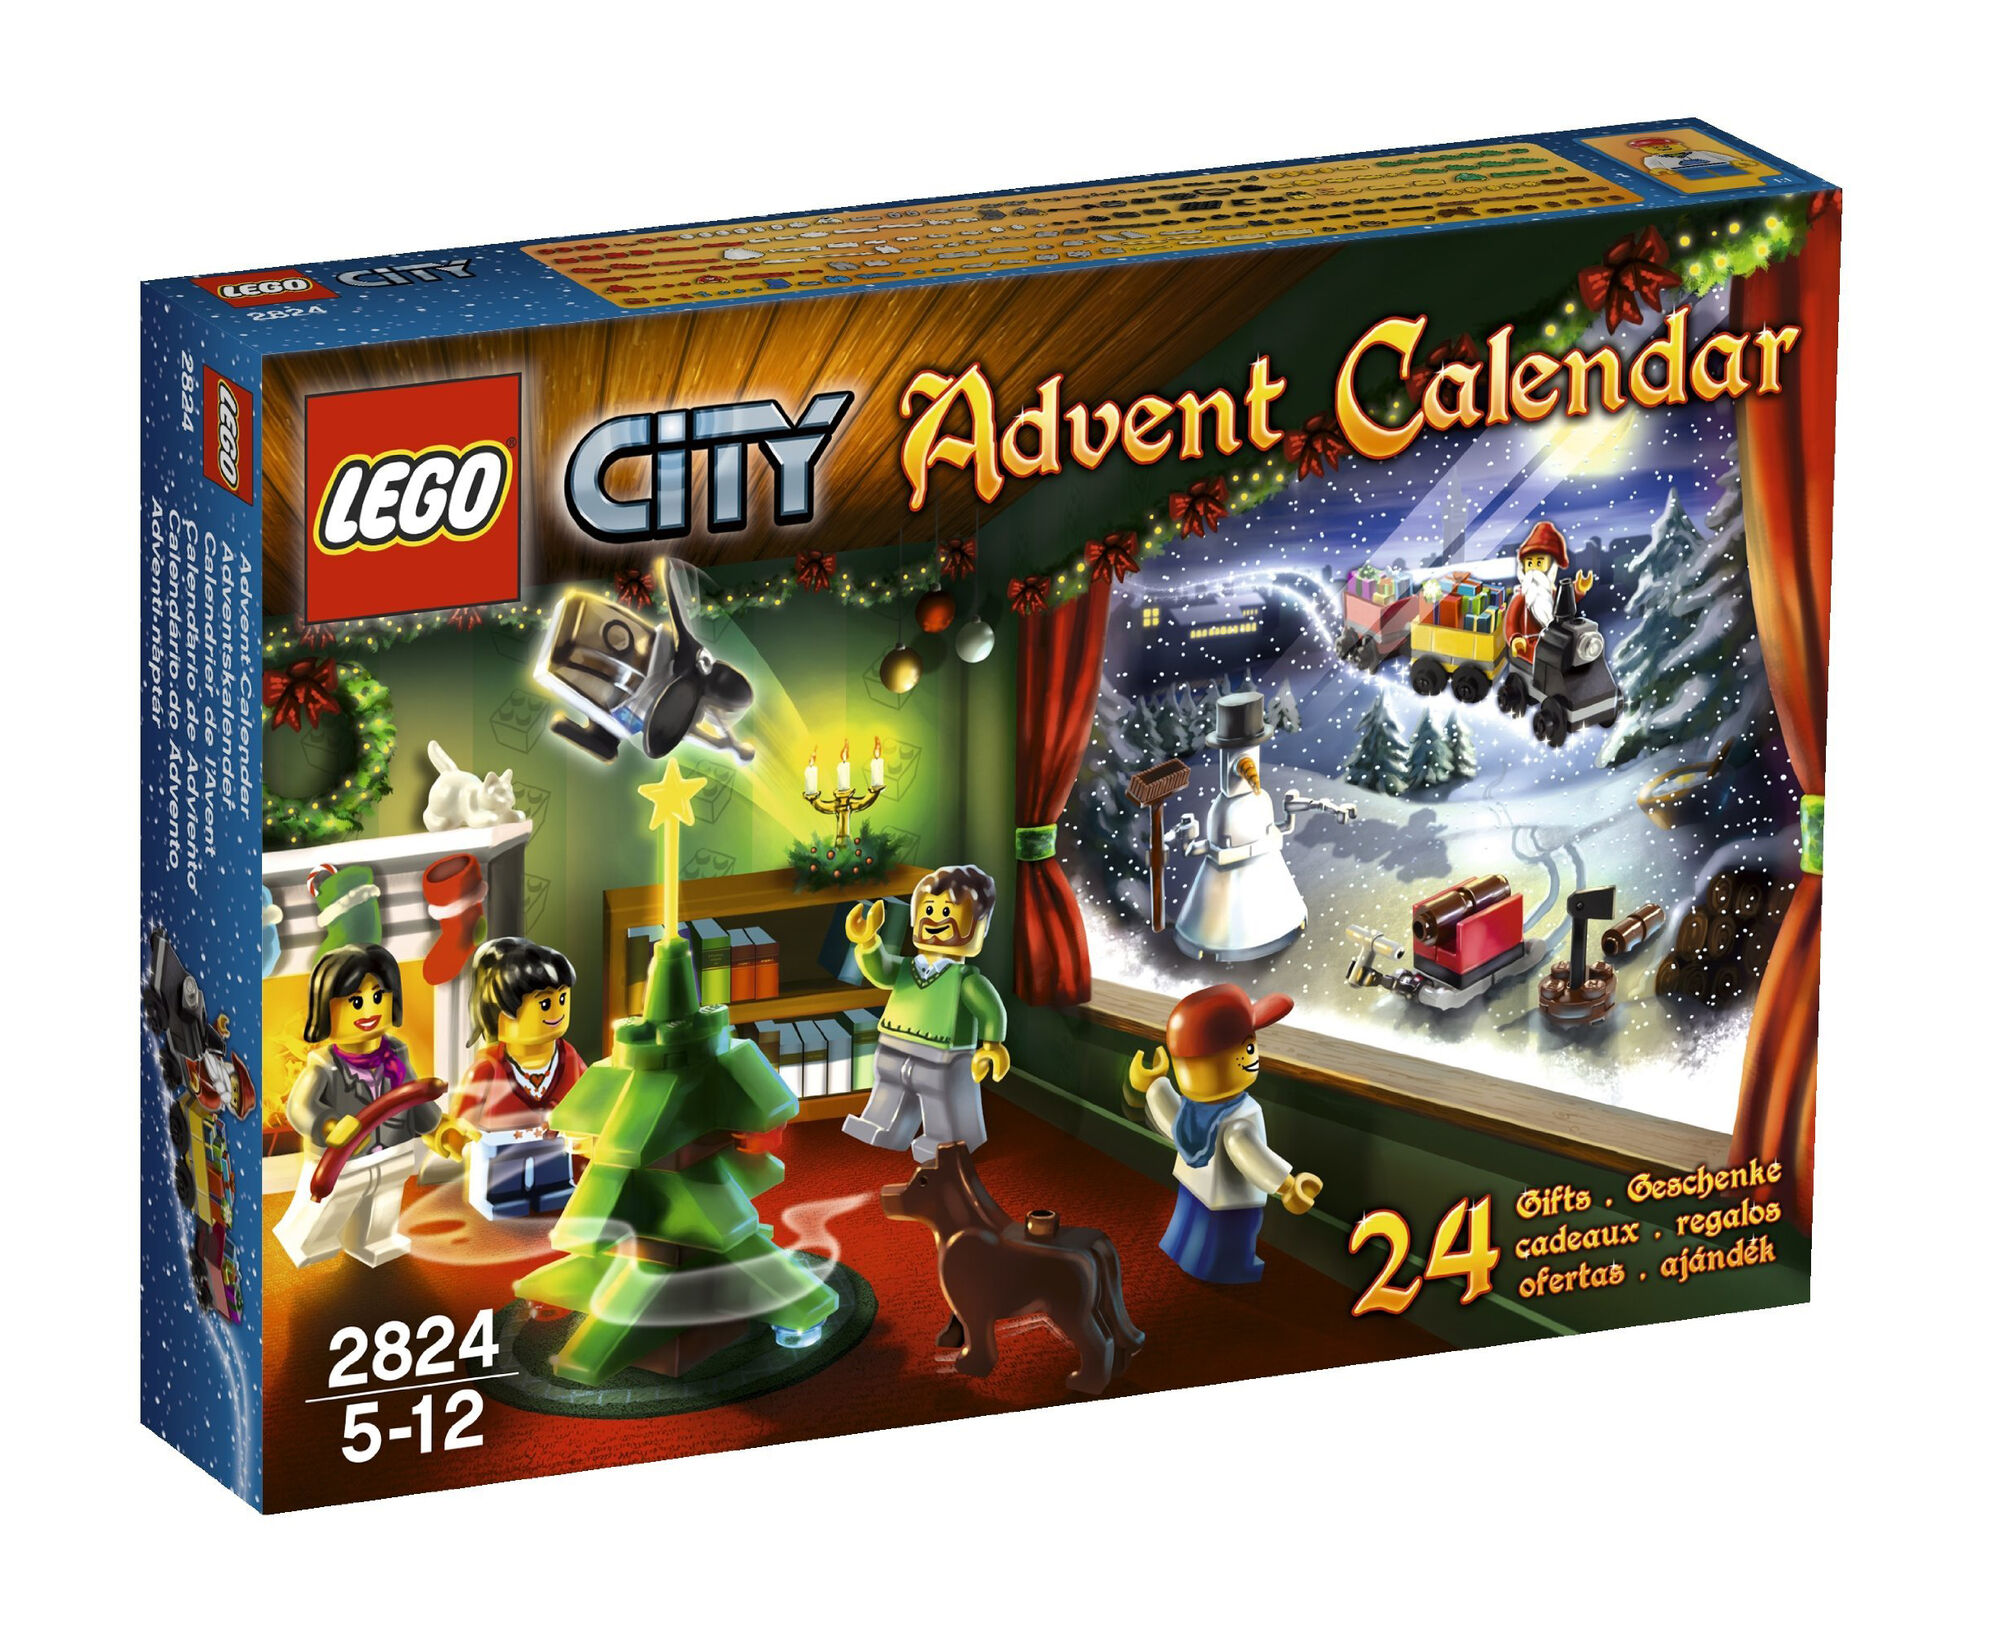 2824 City Advent Calendar Brickipedia Fandom Powered By Wikia